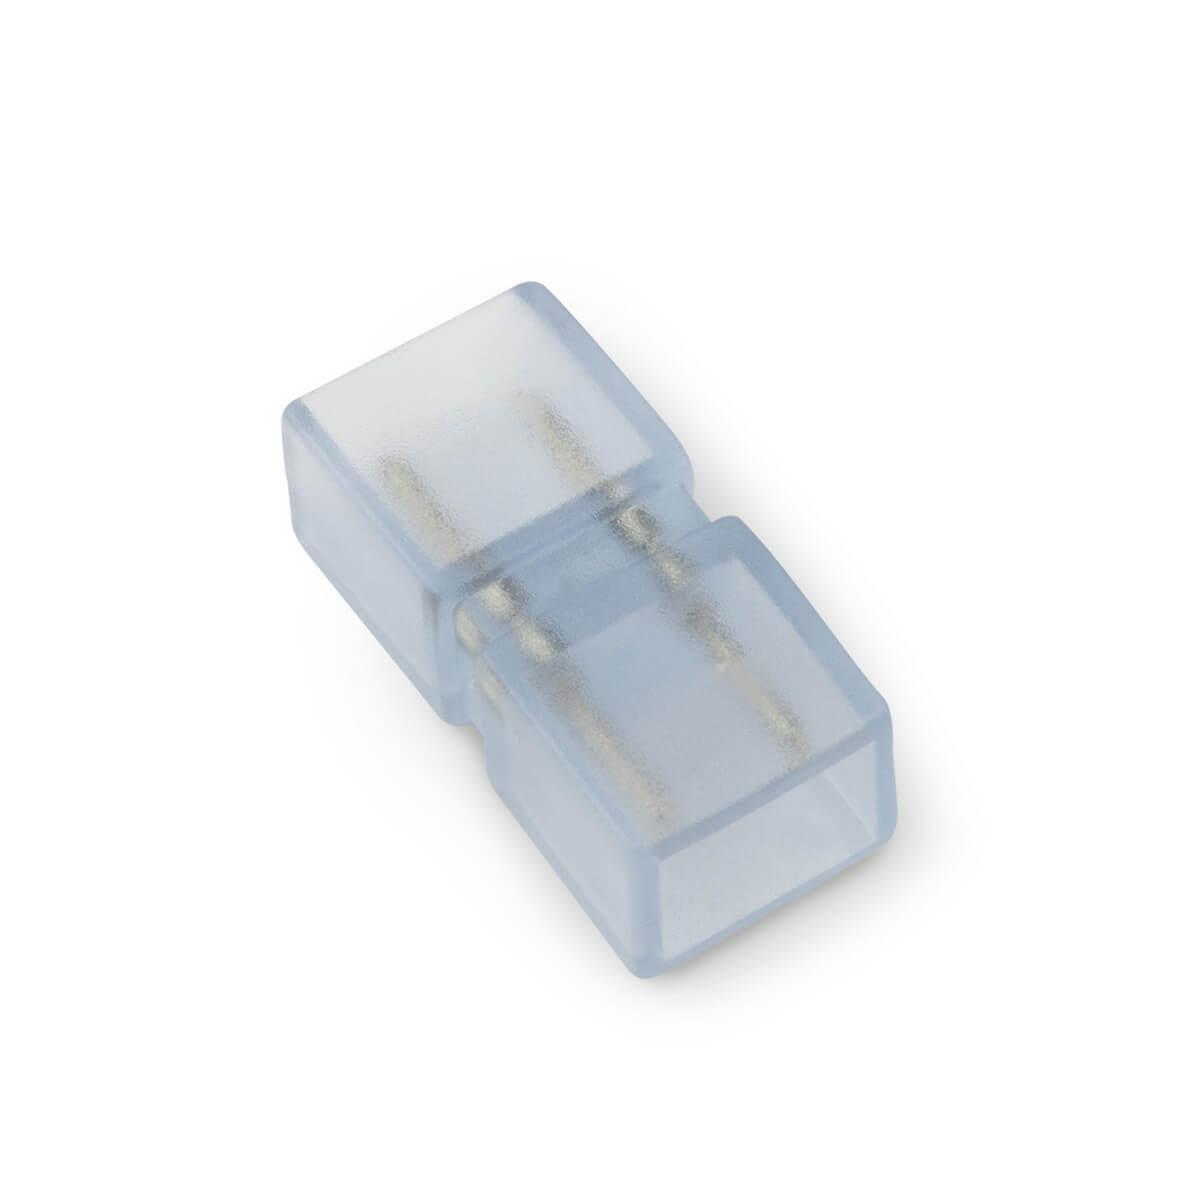 Клемма (UL-00000868) Uniel UTC-K-12/A67-NNN Clear 025 Polybag стоимость